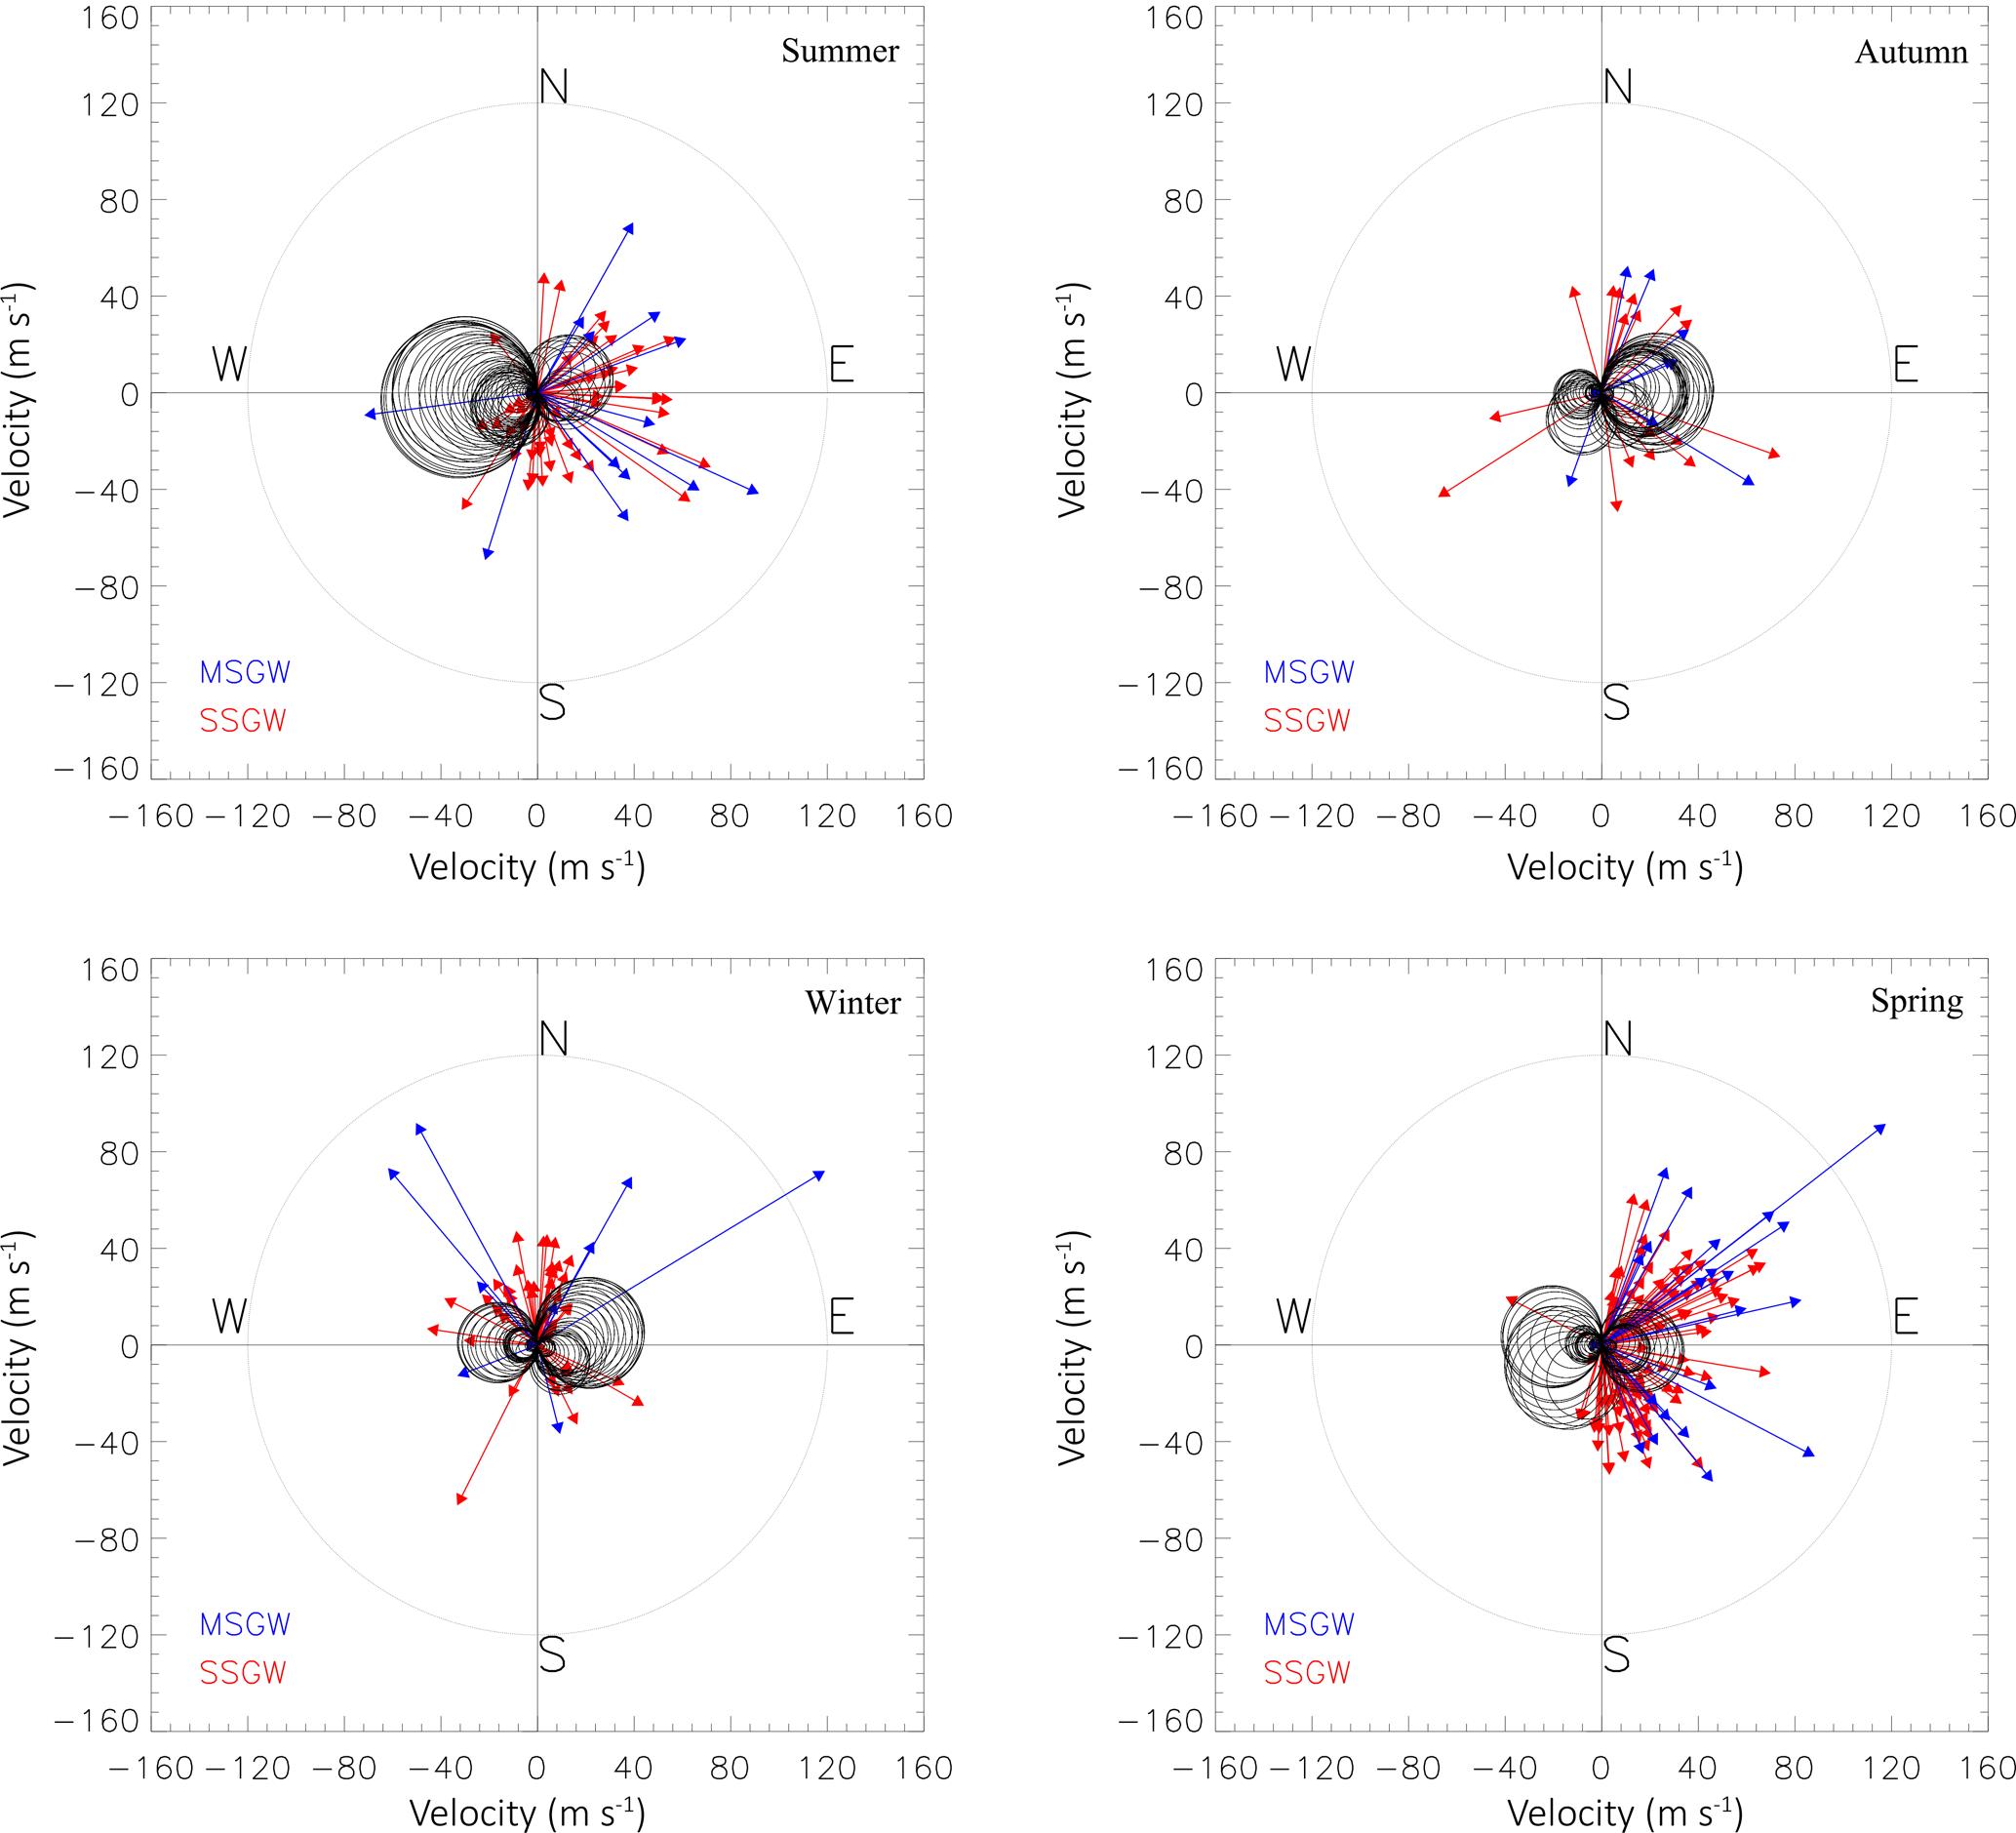 ANGEO - Seasonal characteristics of small- and medium-scale